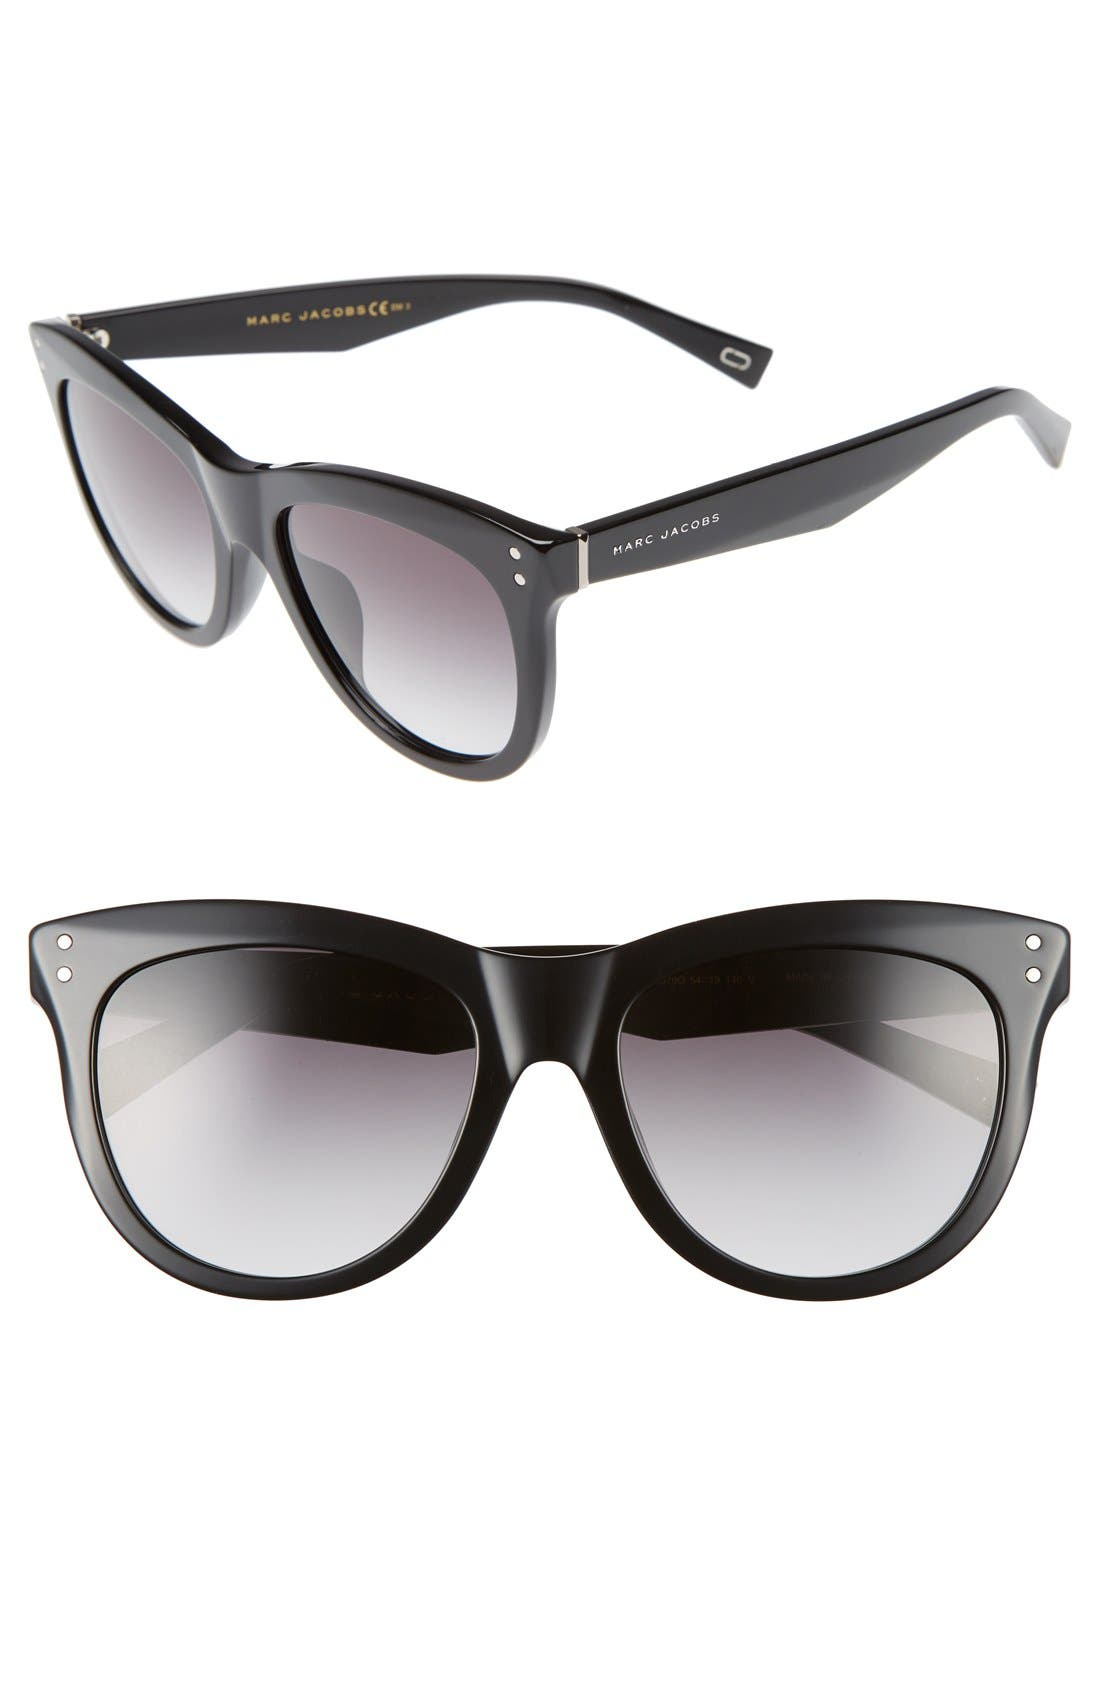 MARC JACOBS,                             54mm Sunglasses,                             Main thumbnail 1, color,                             001